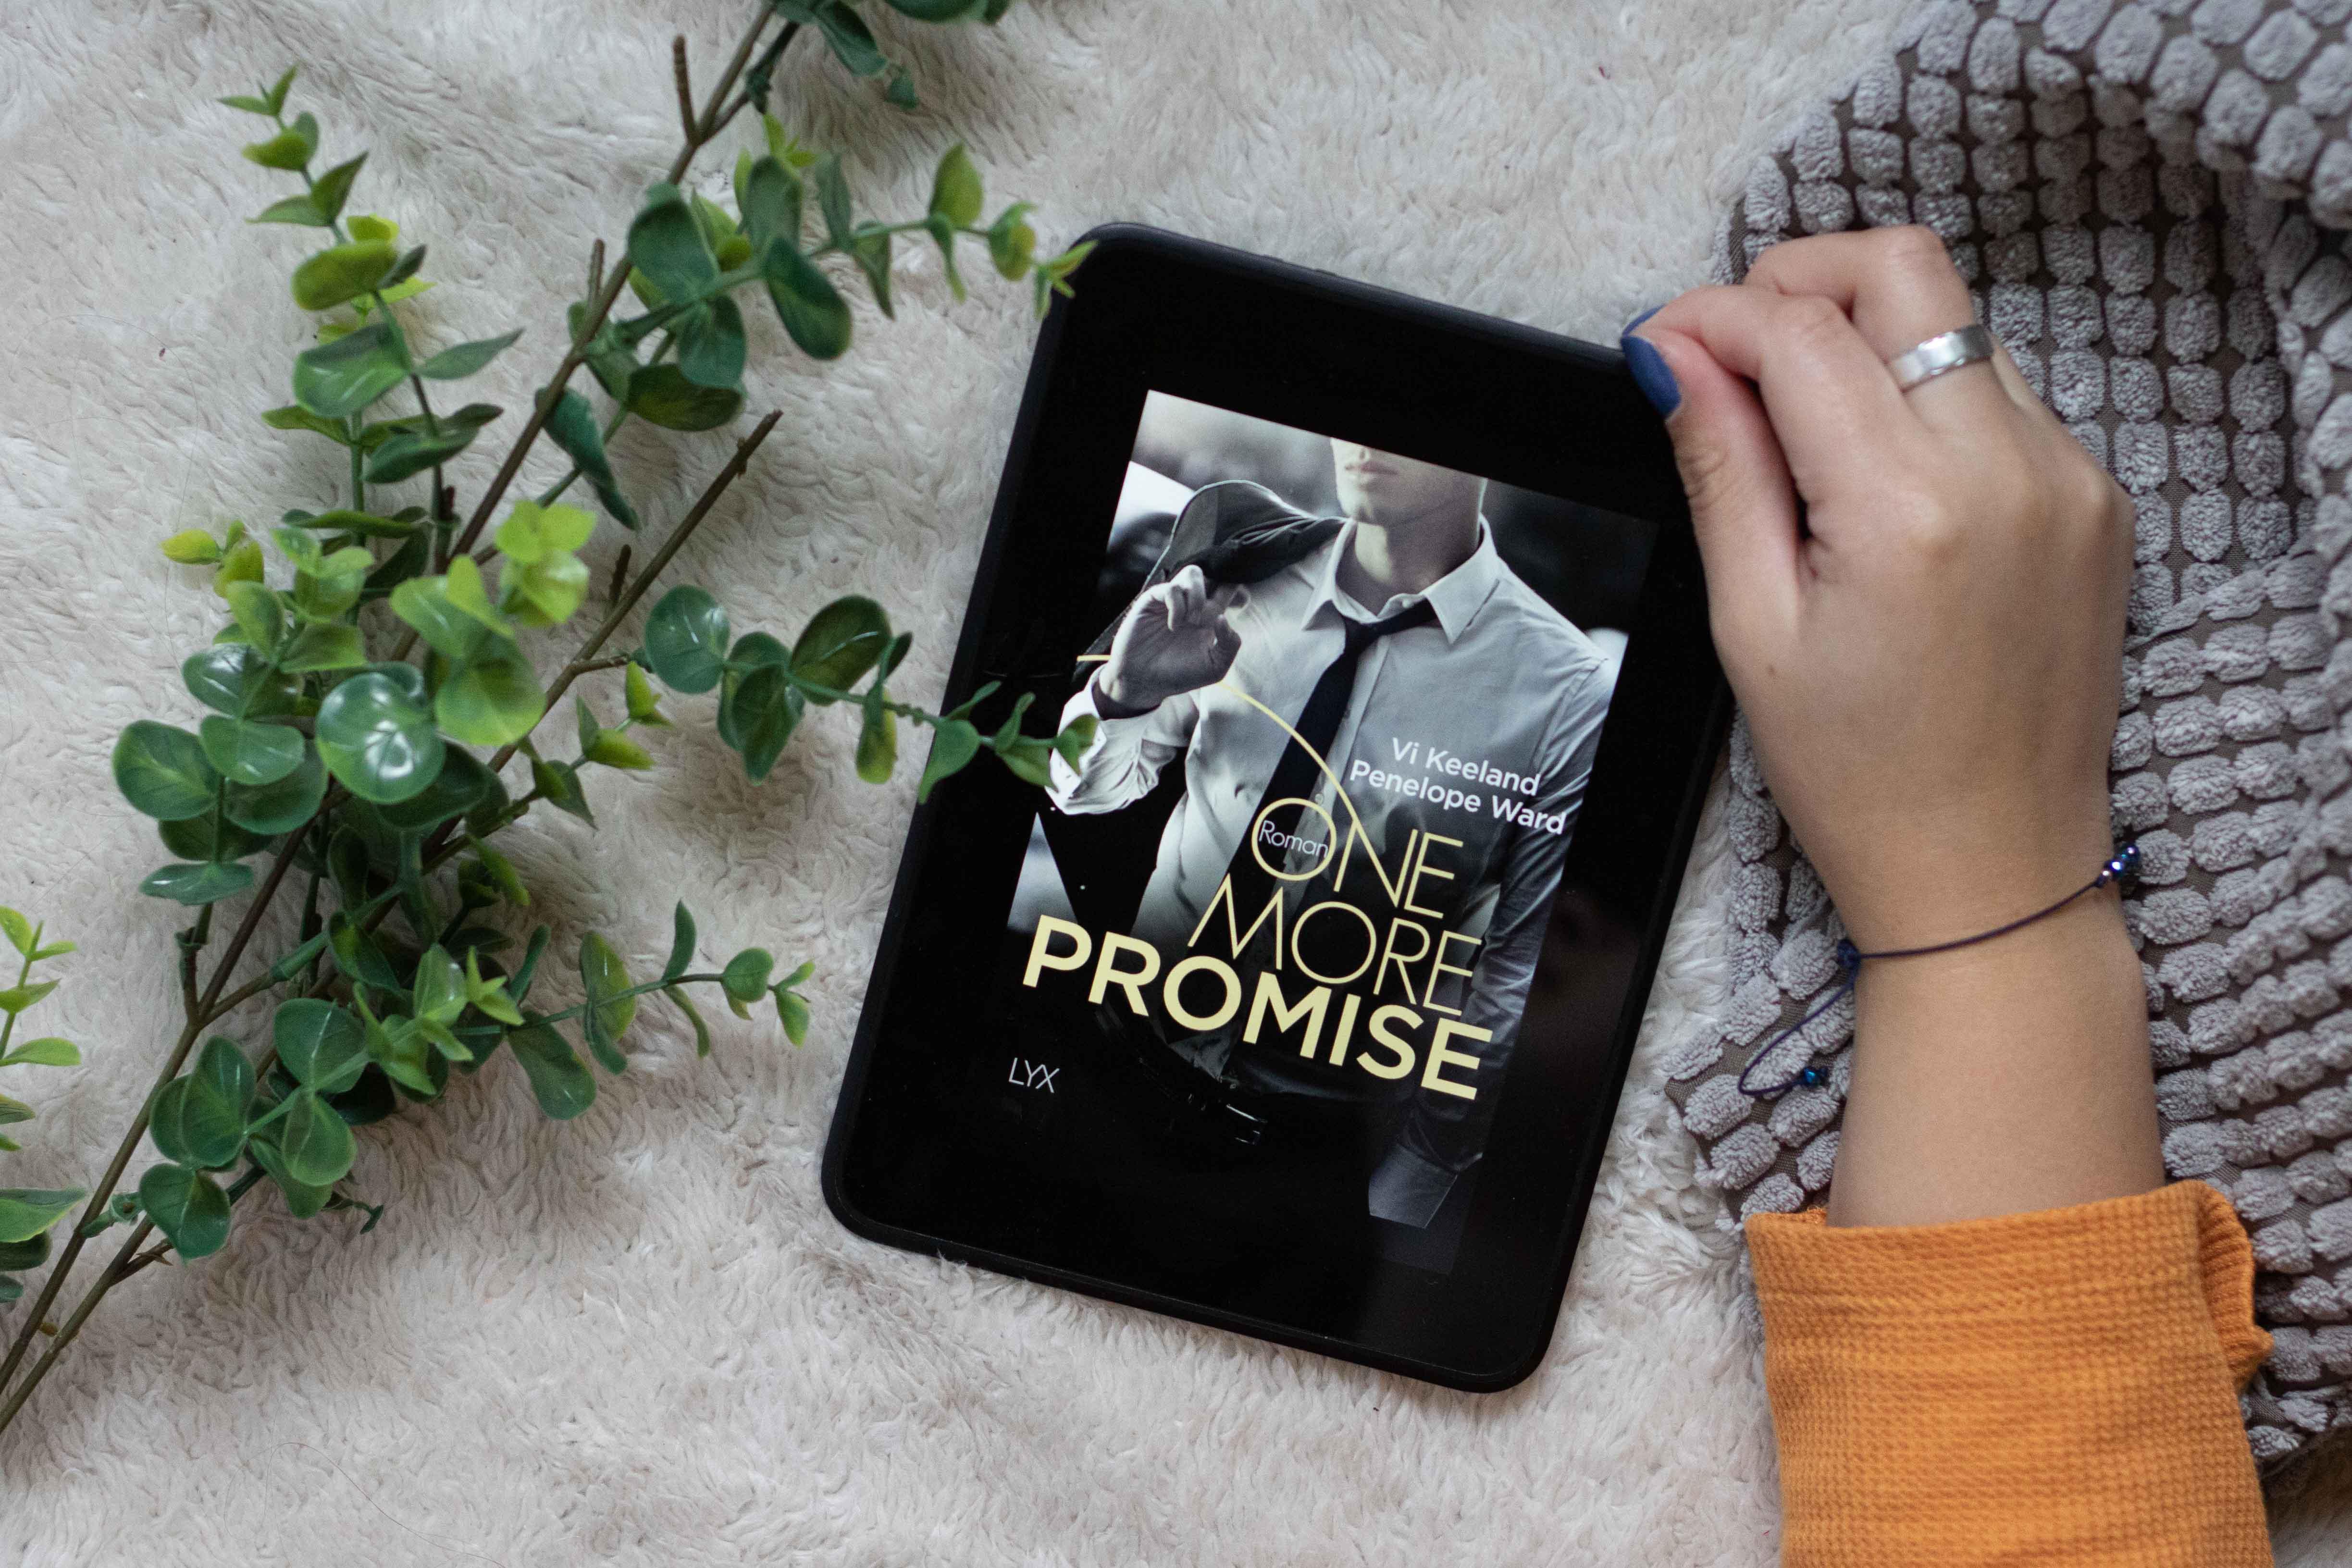 One More Promise | Vi Keeland & Penelope Ward